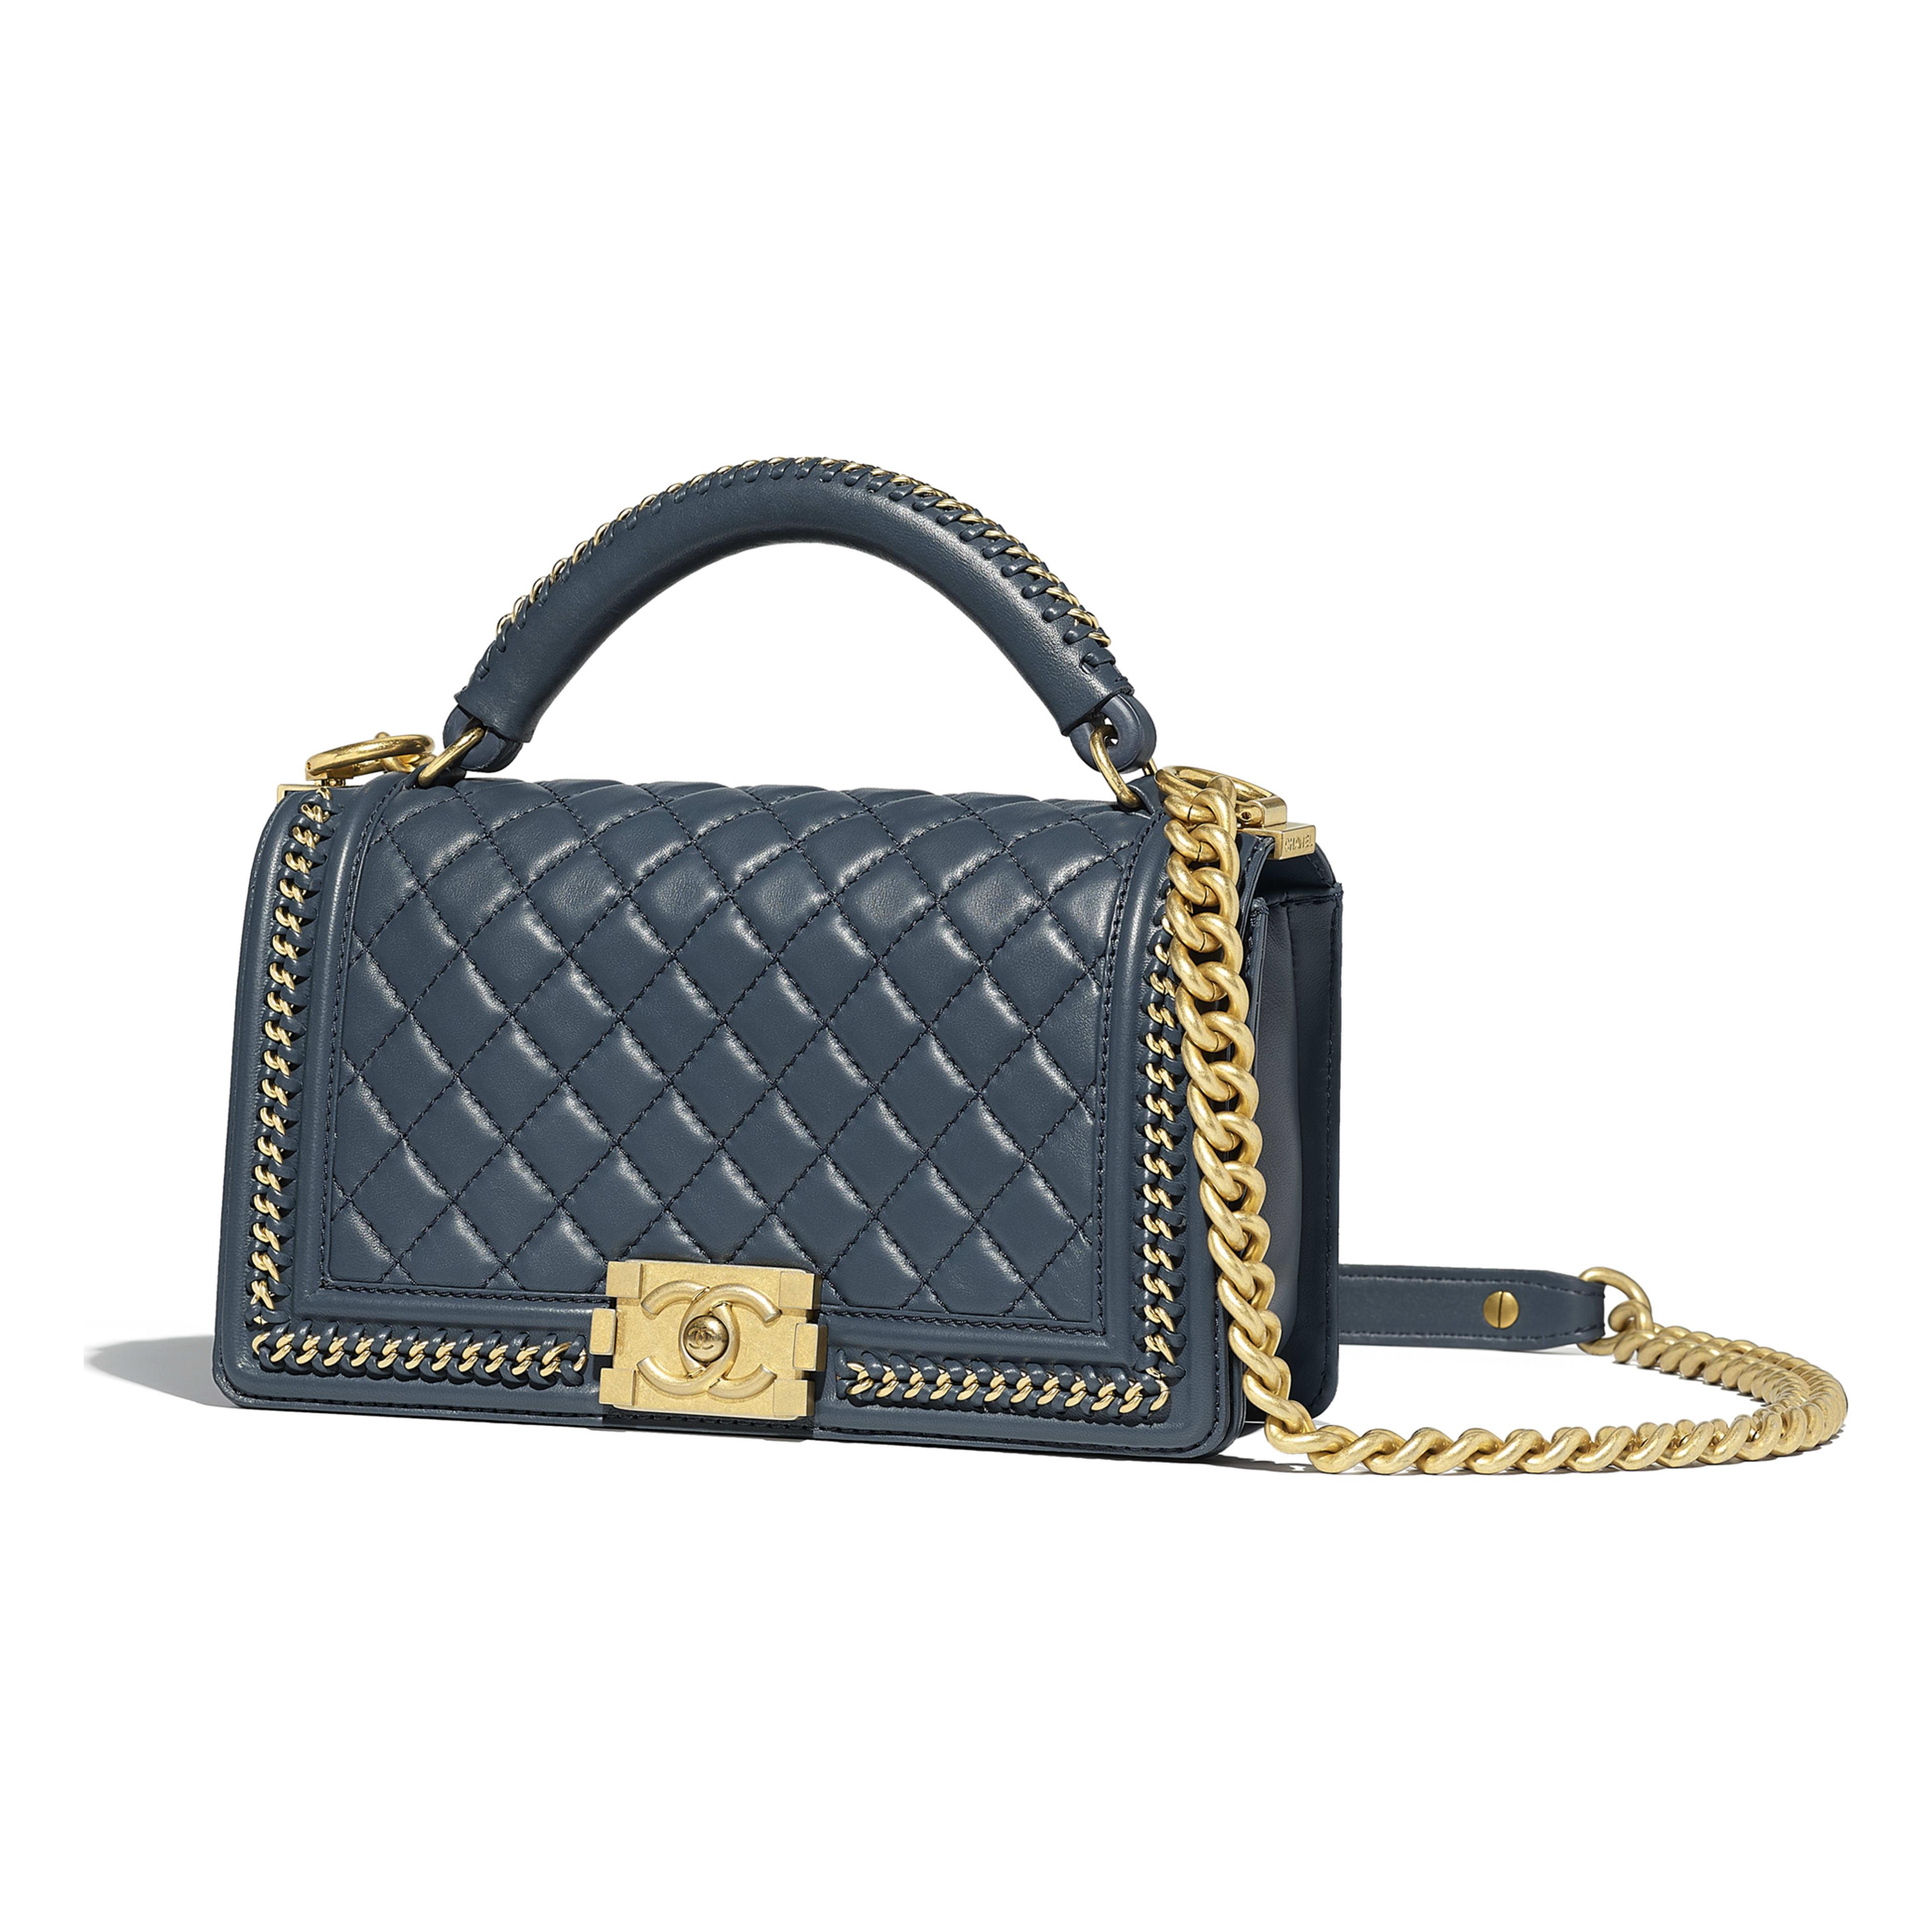 Boy Chanel Flap Bag With Handle